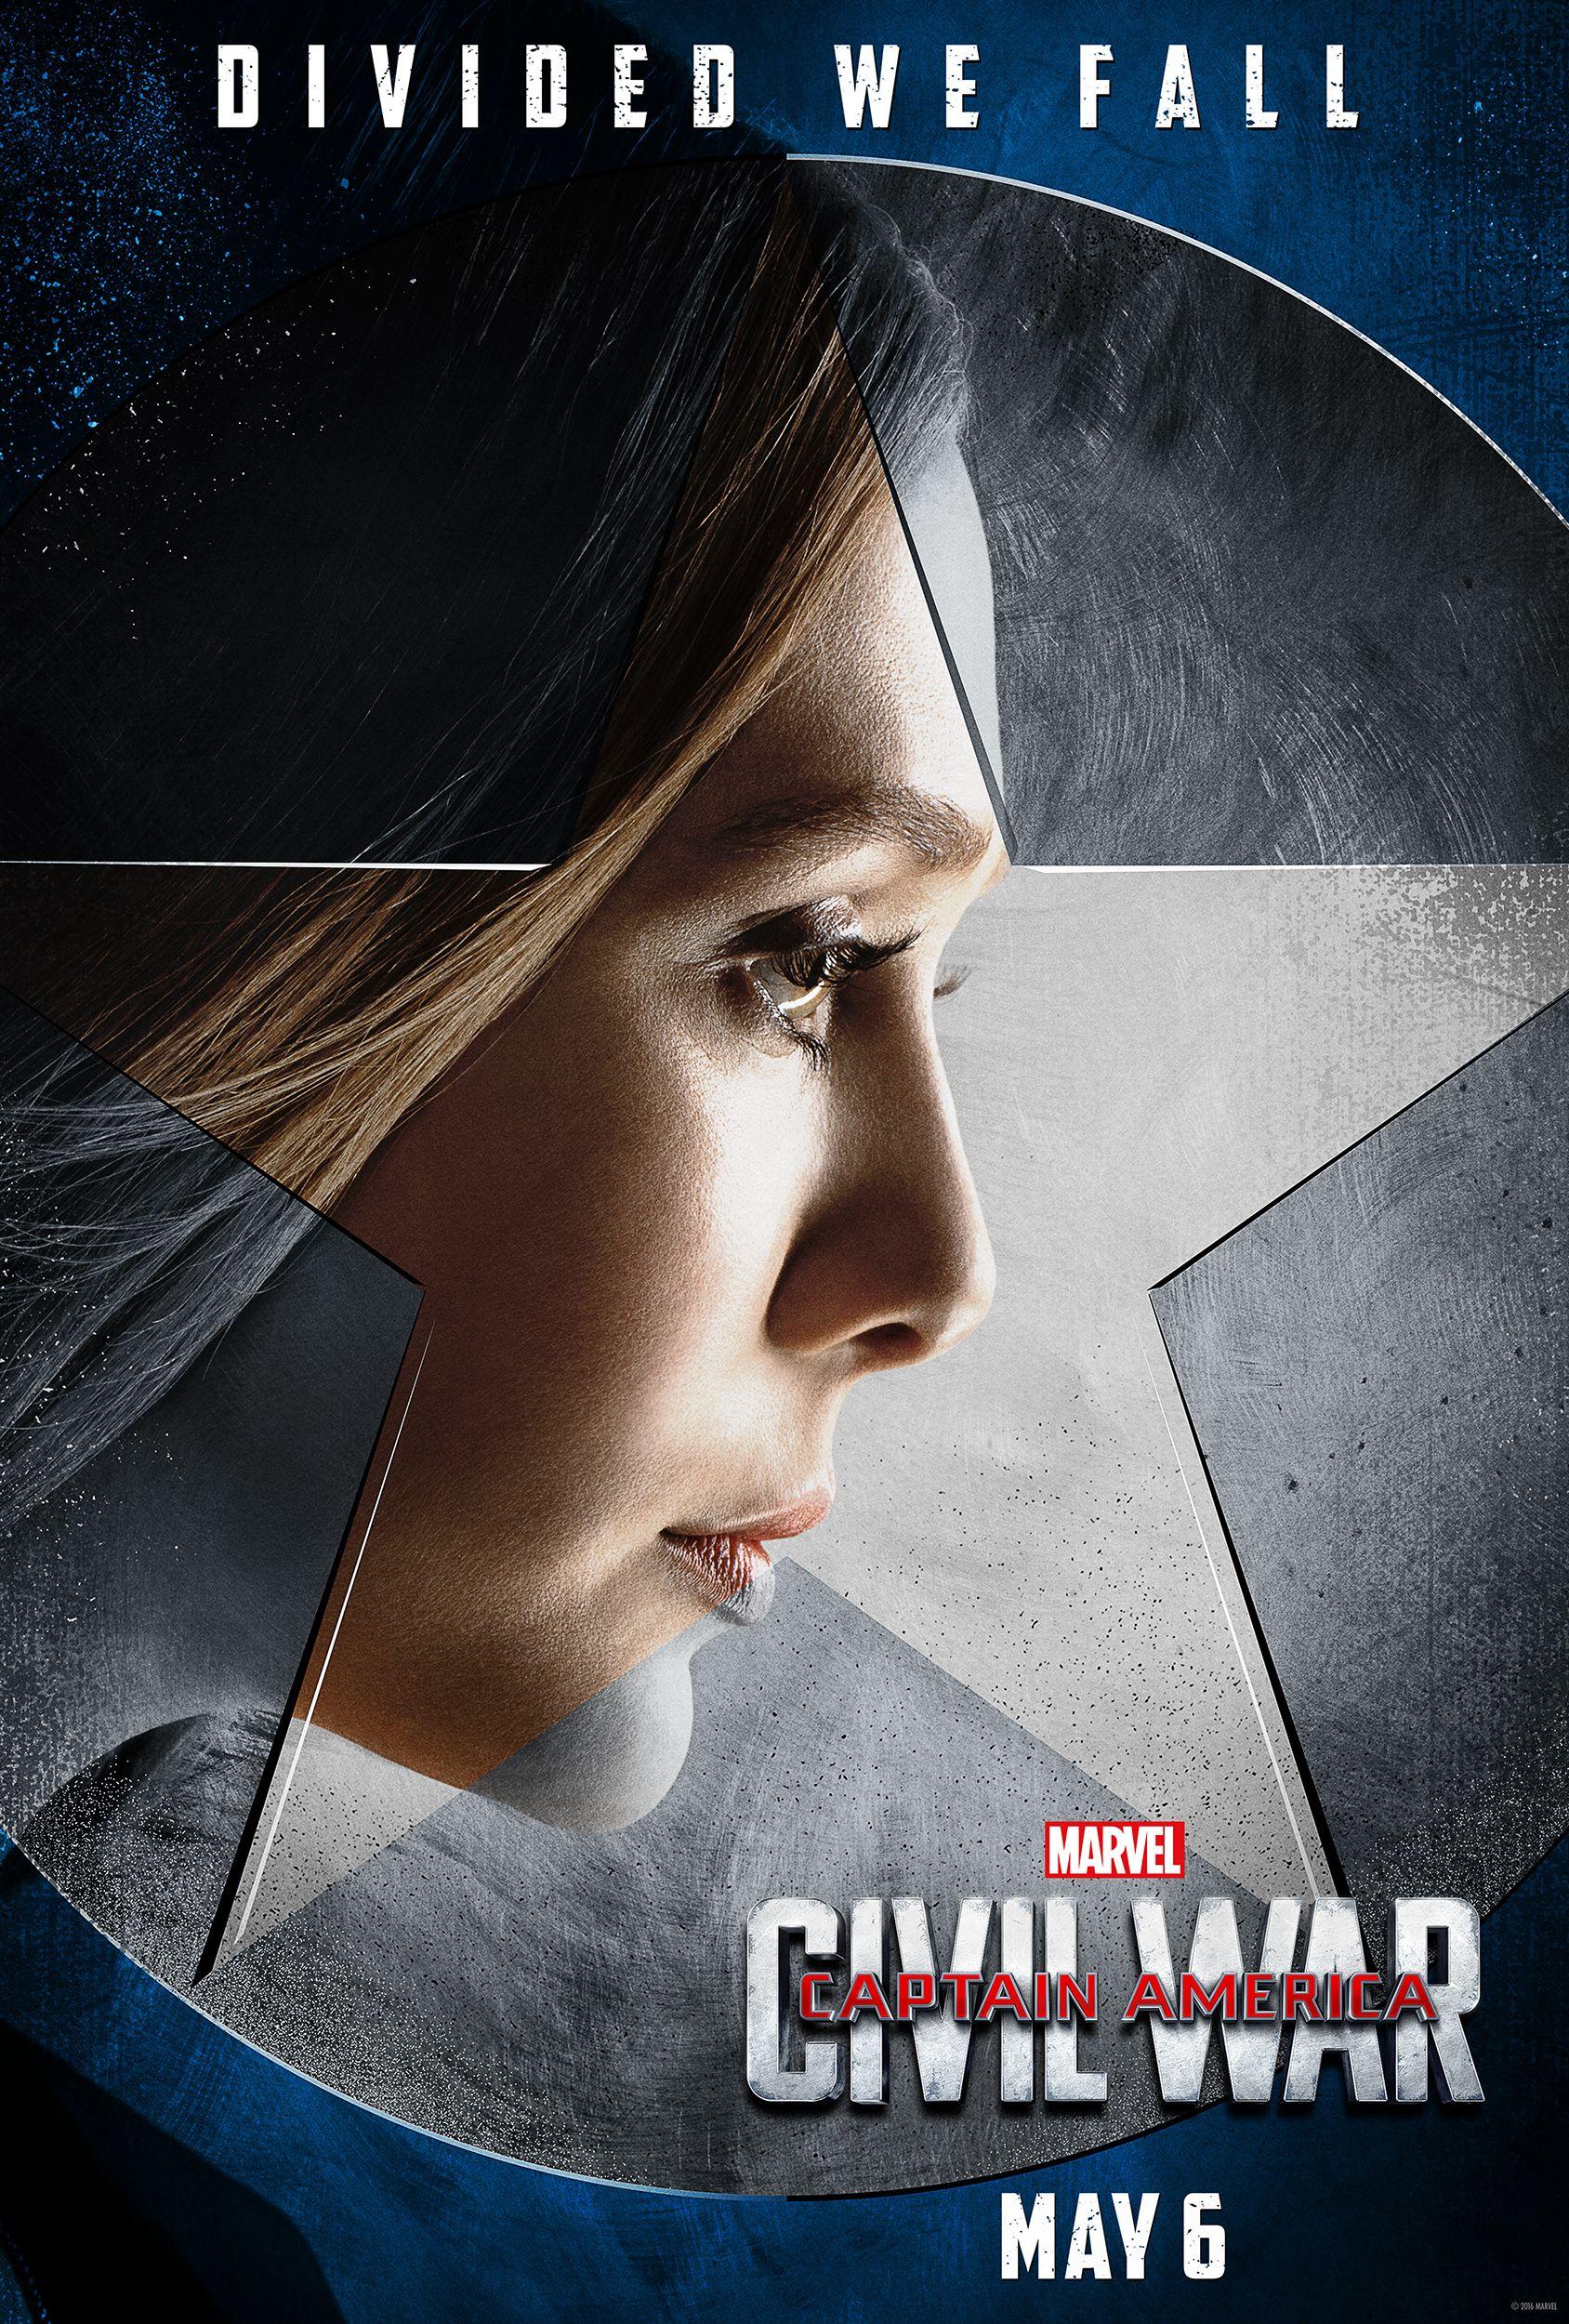 Captain America Civil War Posters Highlight Team Cap Collider